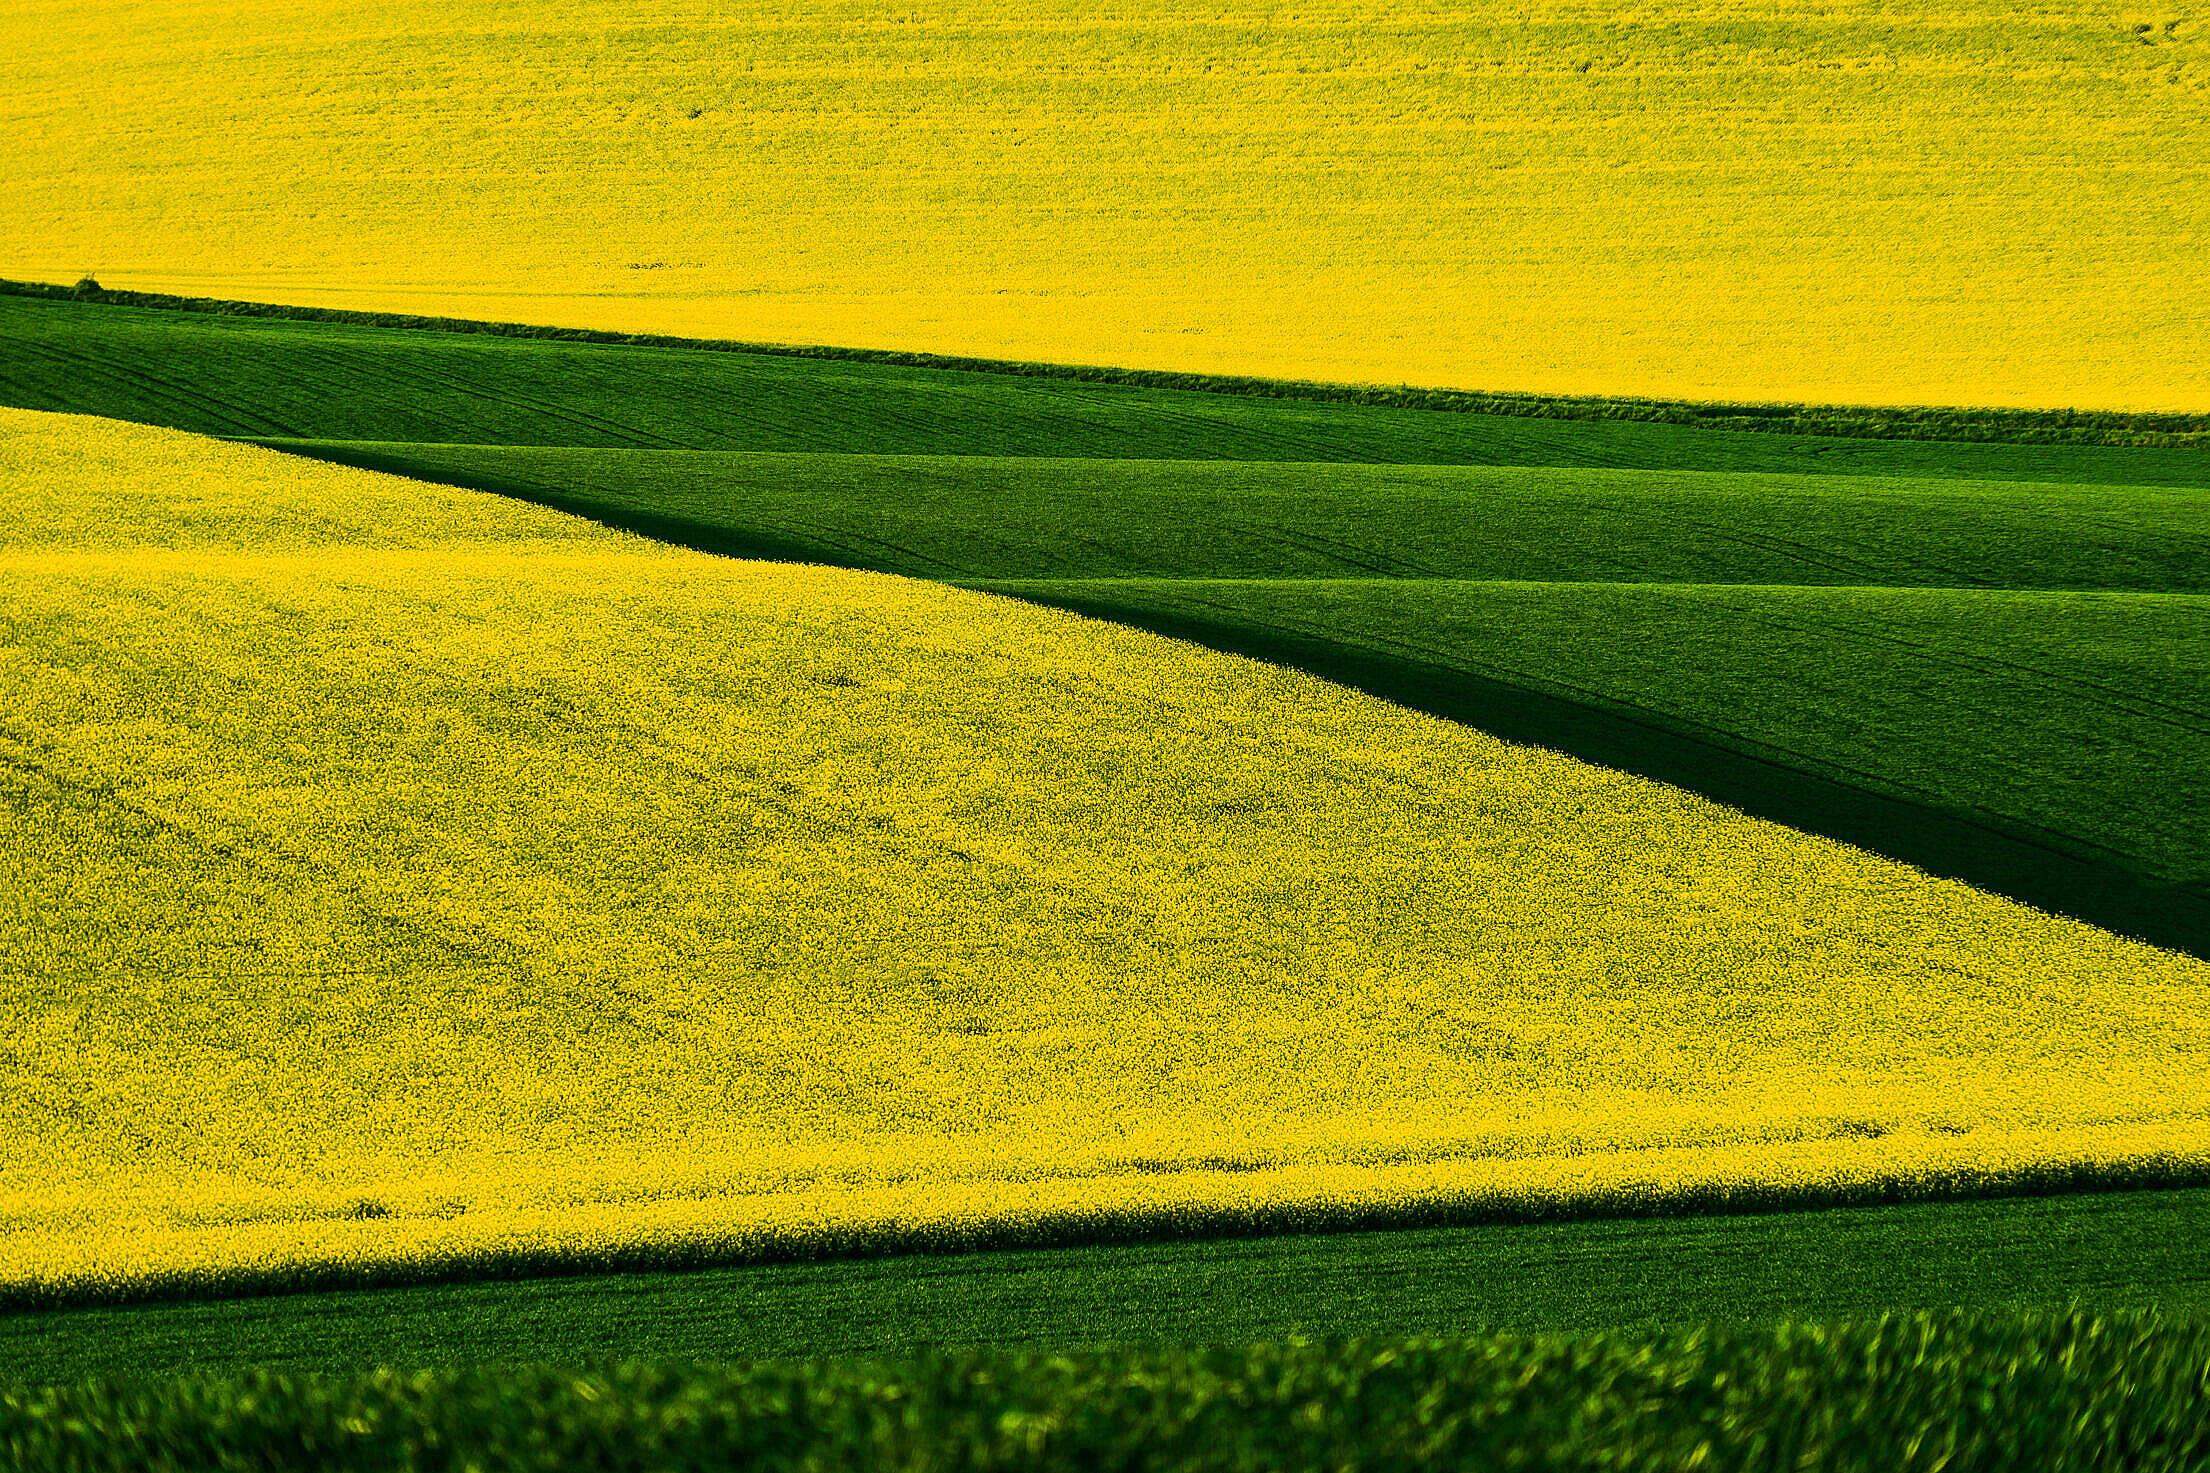 Rapeseed and Wheat Fields in Czechia Free Stock Photo